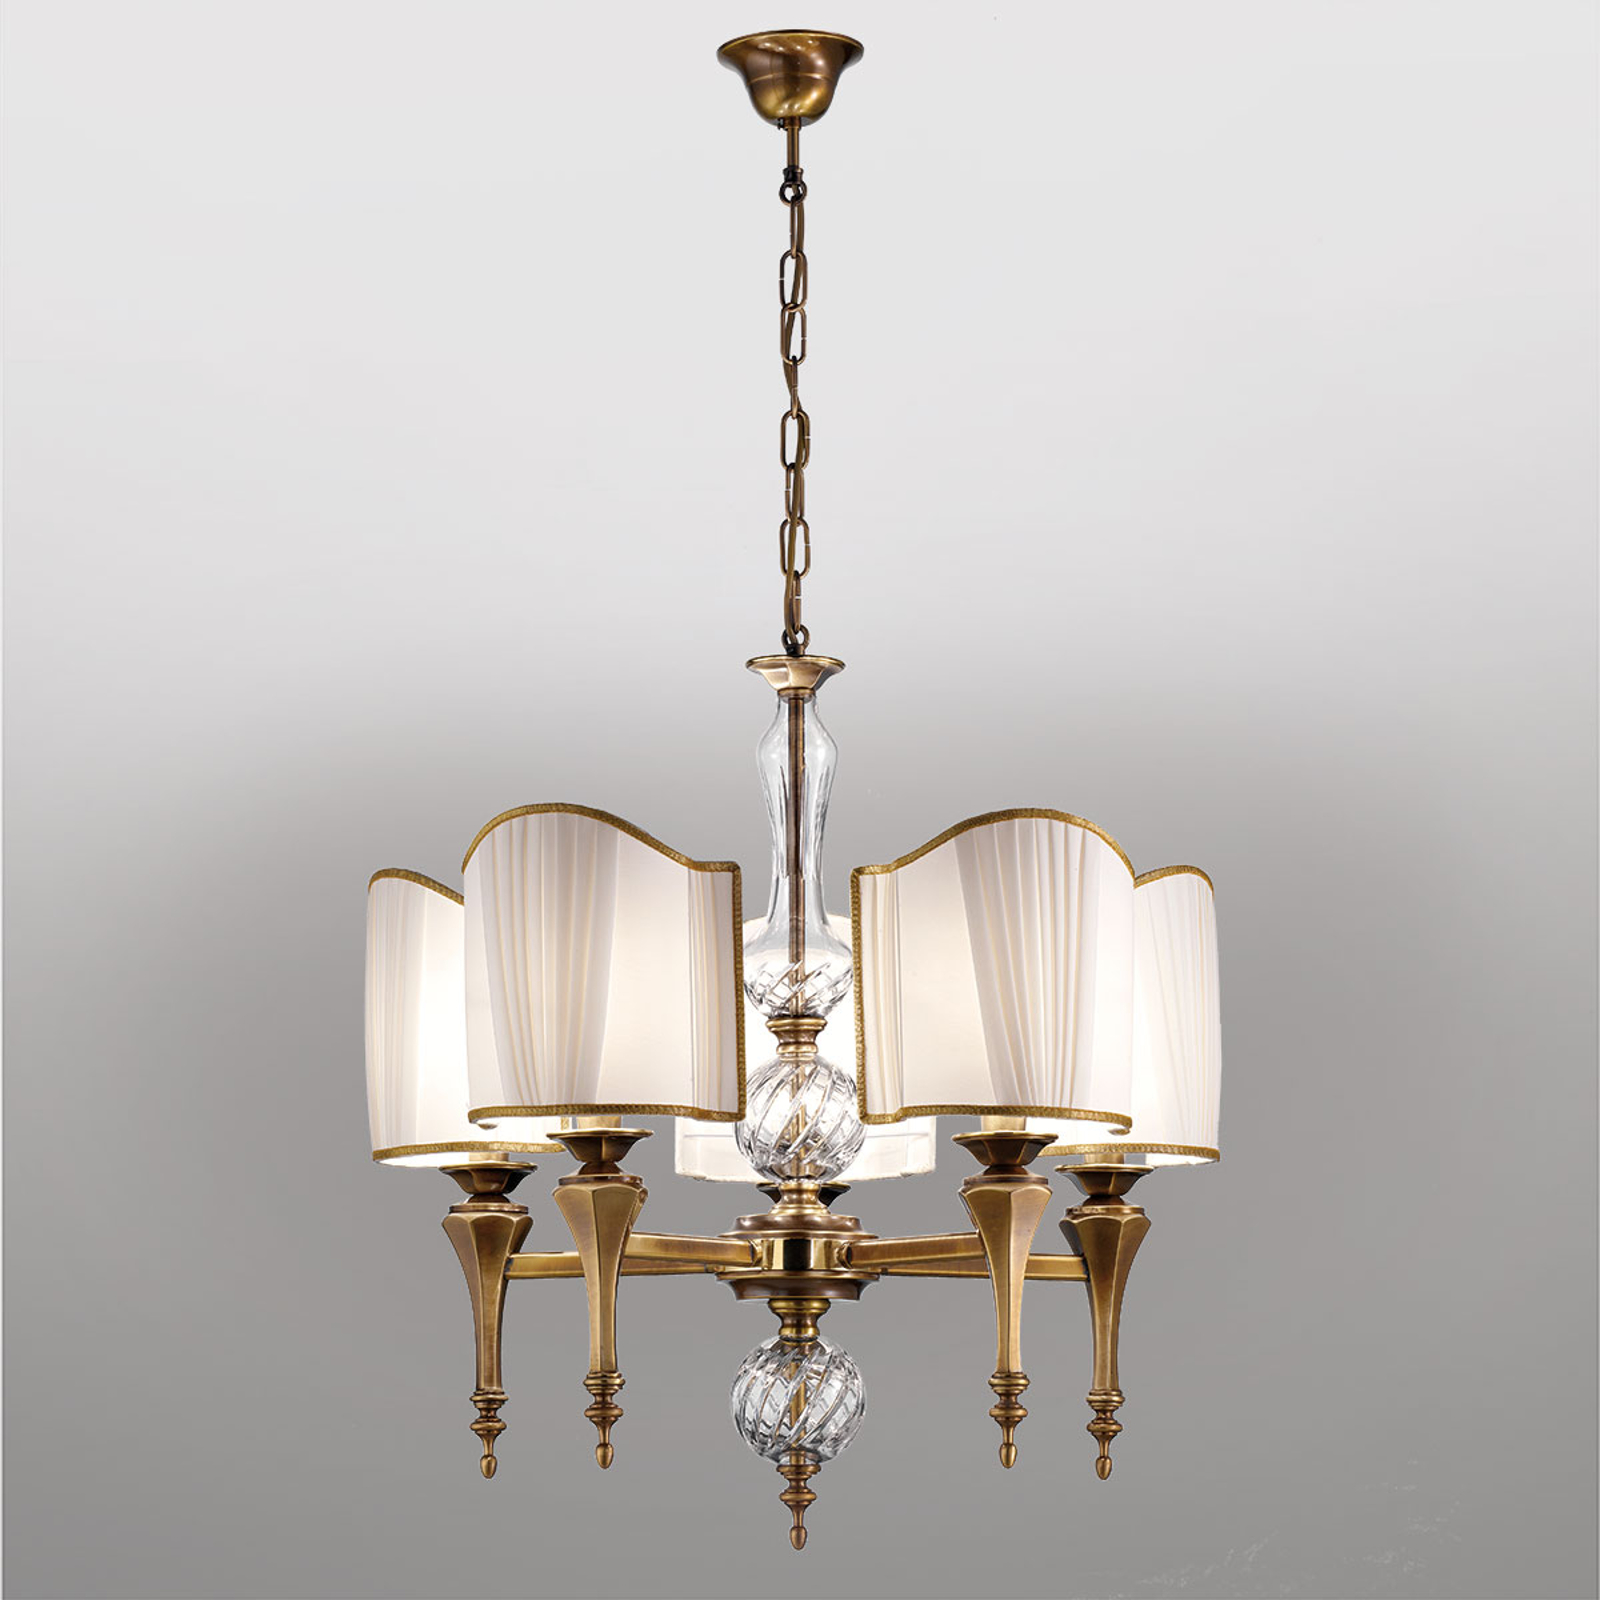 Lámpara colgante de aspecto antiguo Belle Epoque